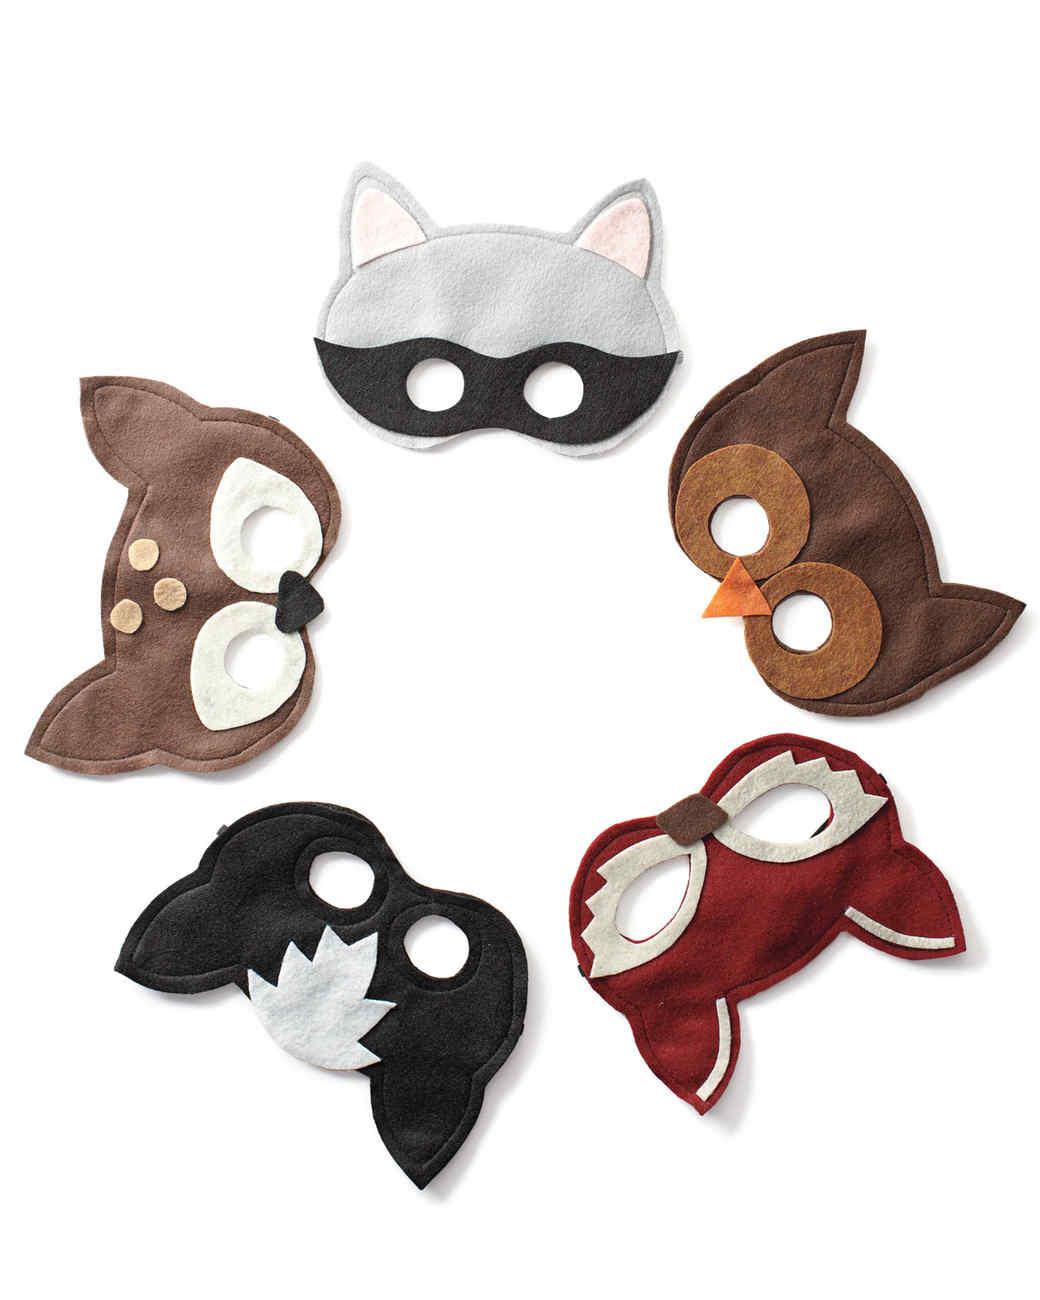 masks-md108096.jpg